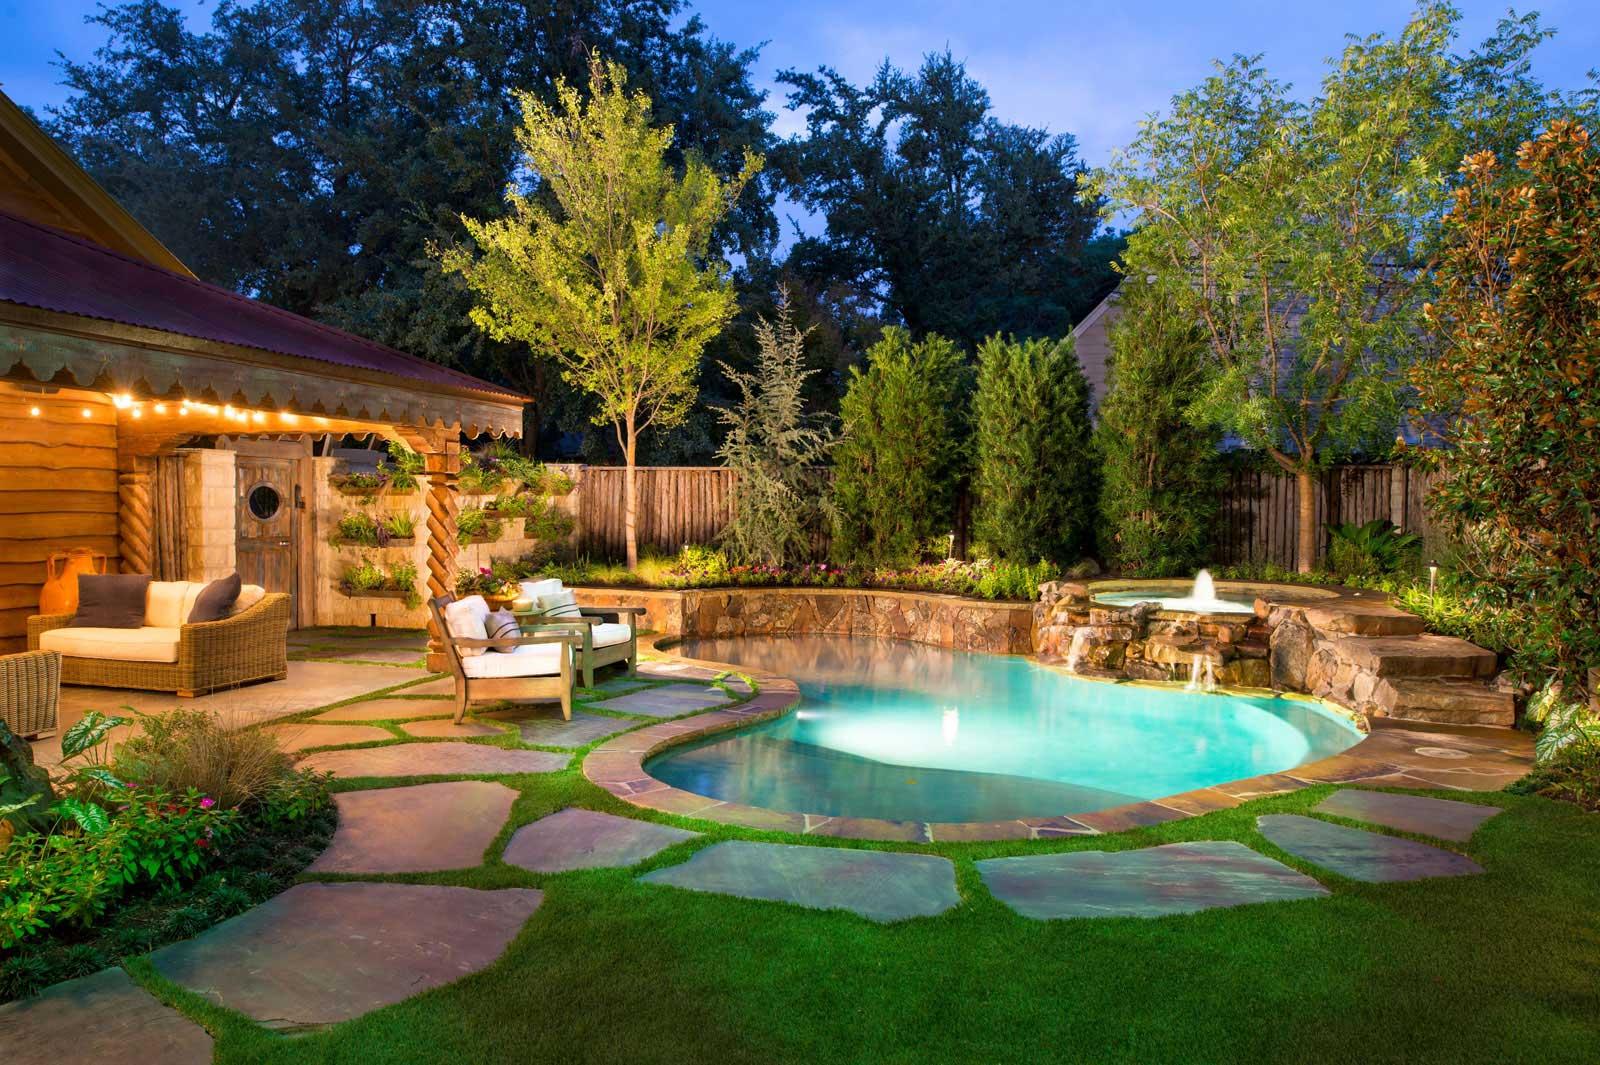 Pool Remodel Dallas Interior Pool Environments Inc.